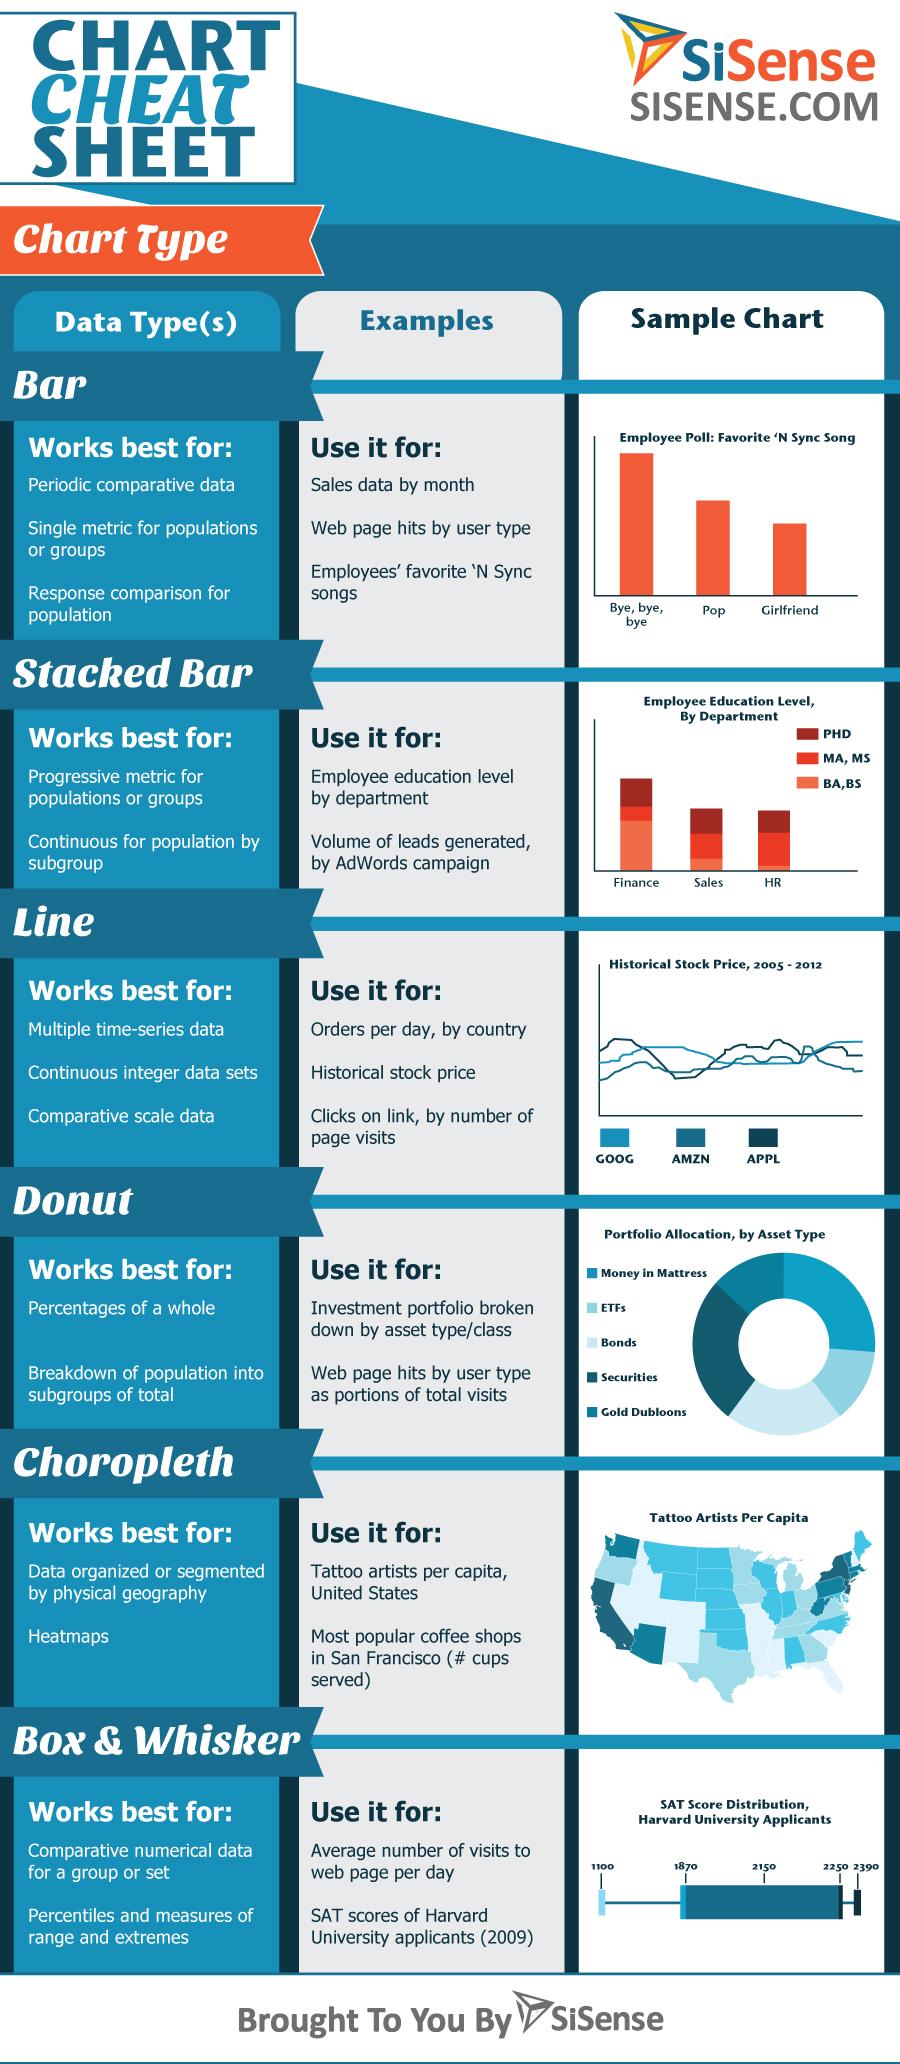 dashboard design sisense infographic chart cheat sheet